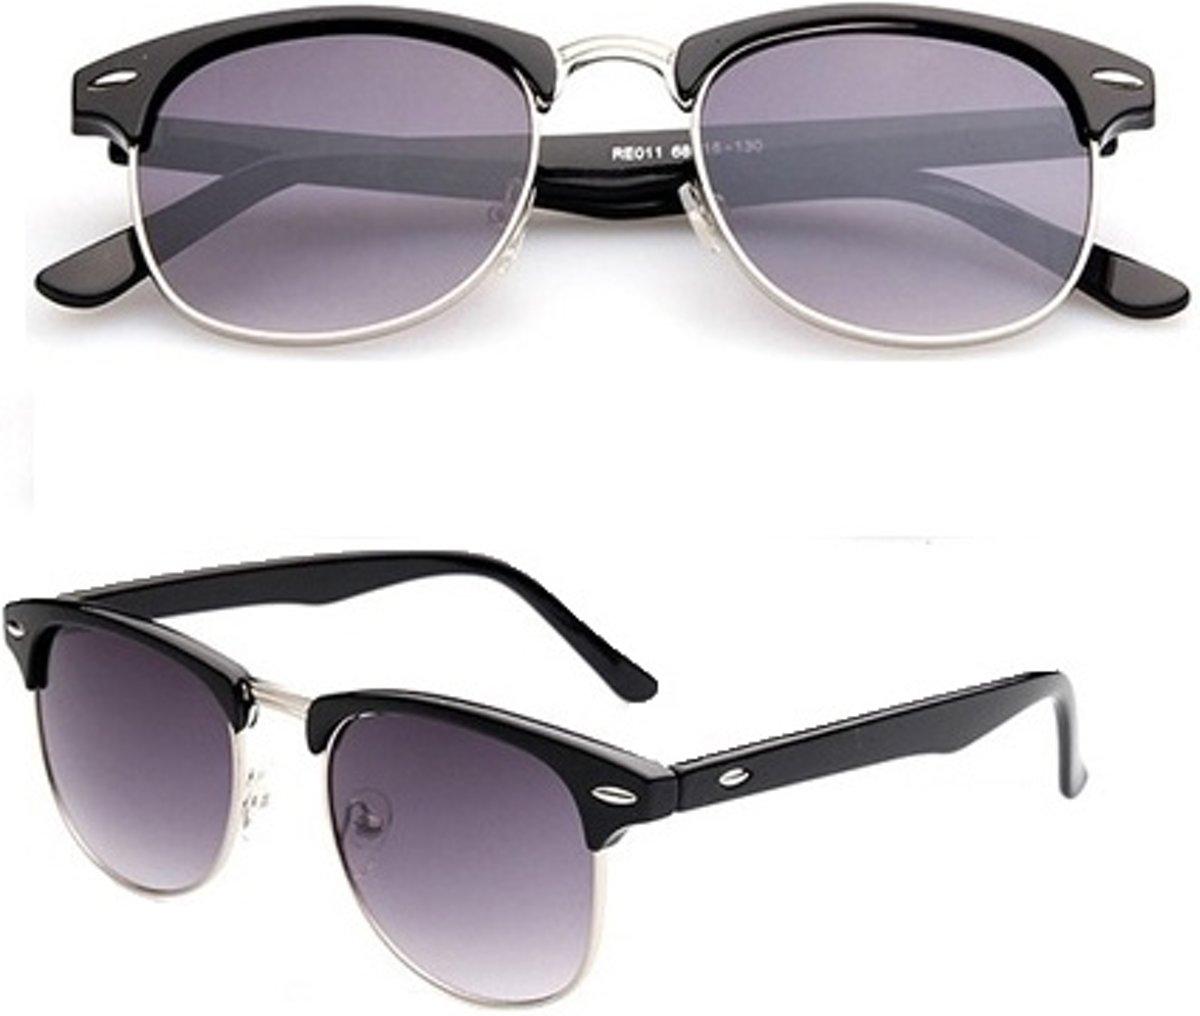 Retro Clubmaster Zonnebril - Black/Silver | Zwart/Zilver | Fashion Favorite